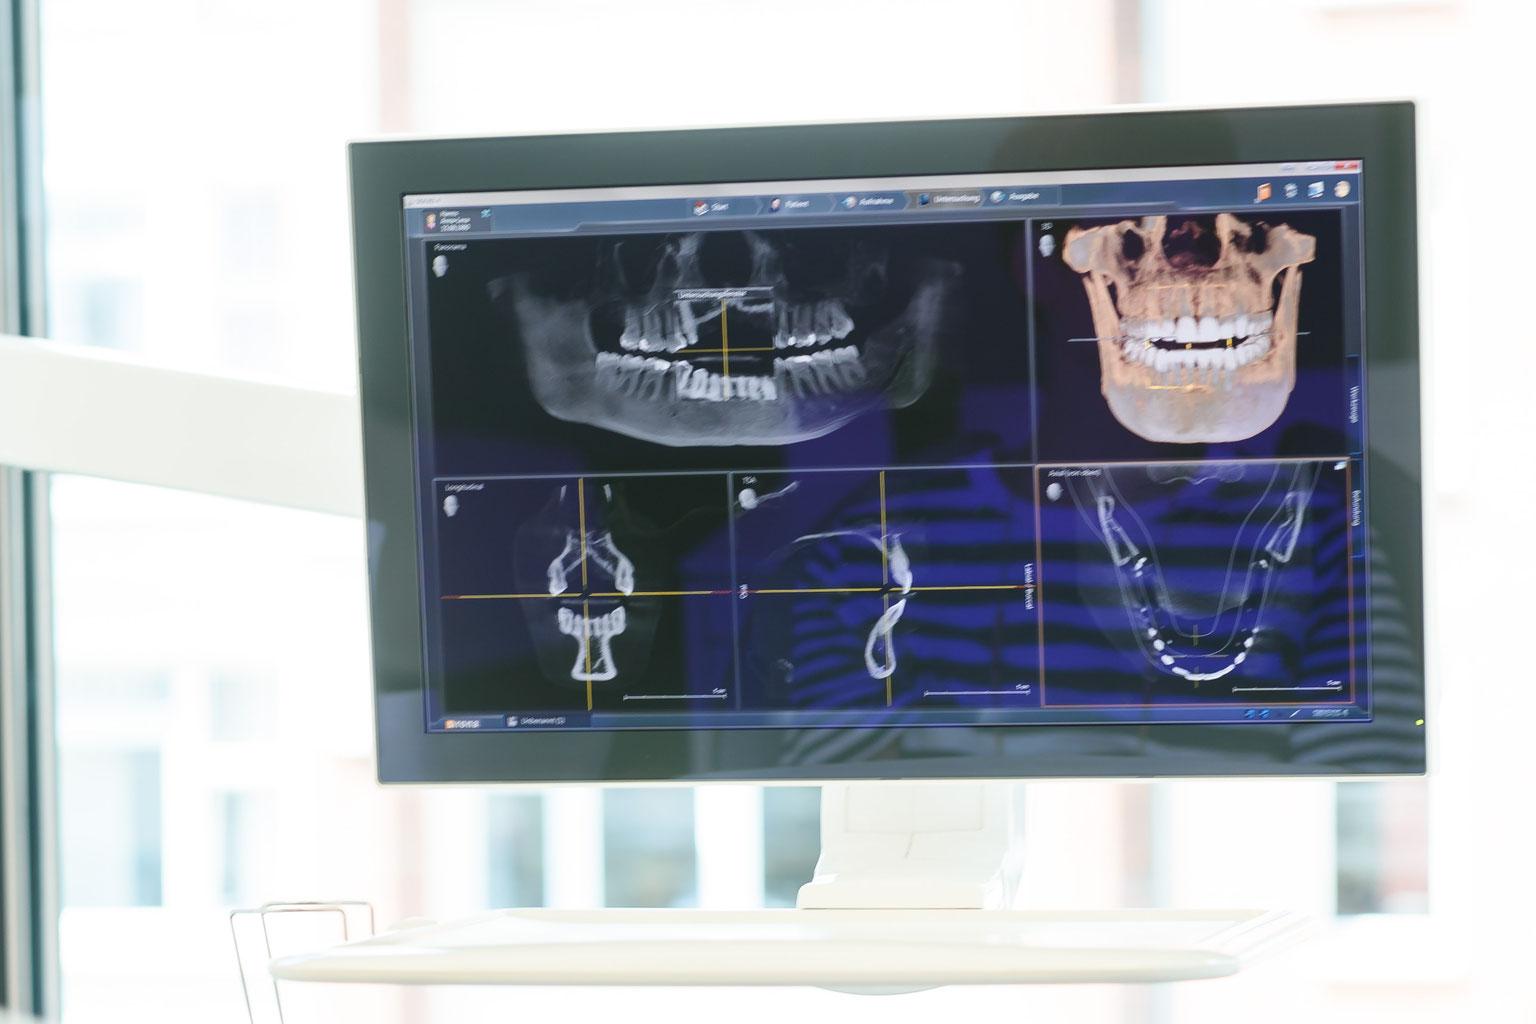 Digitales Röntgen (2D/ 3D) - Praxis Dr. Jakob - Ihr Zahnarzt in Hamburg!